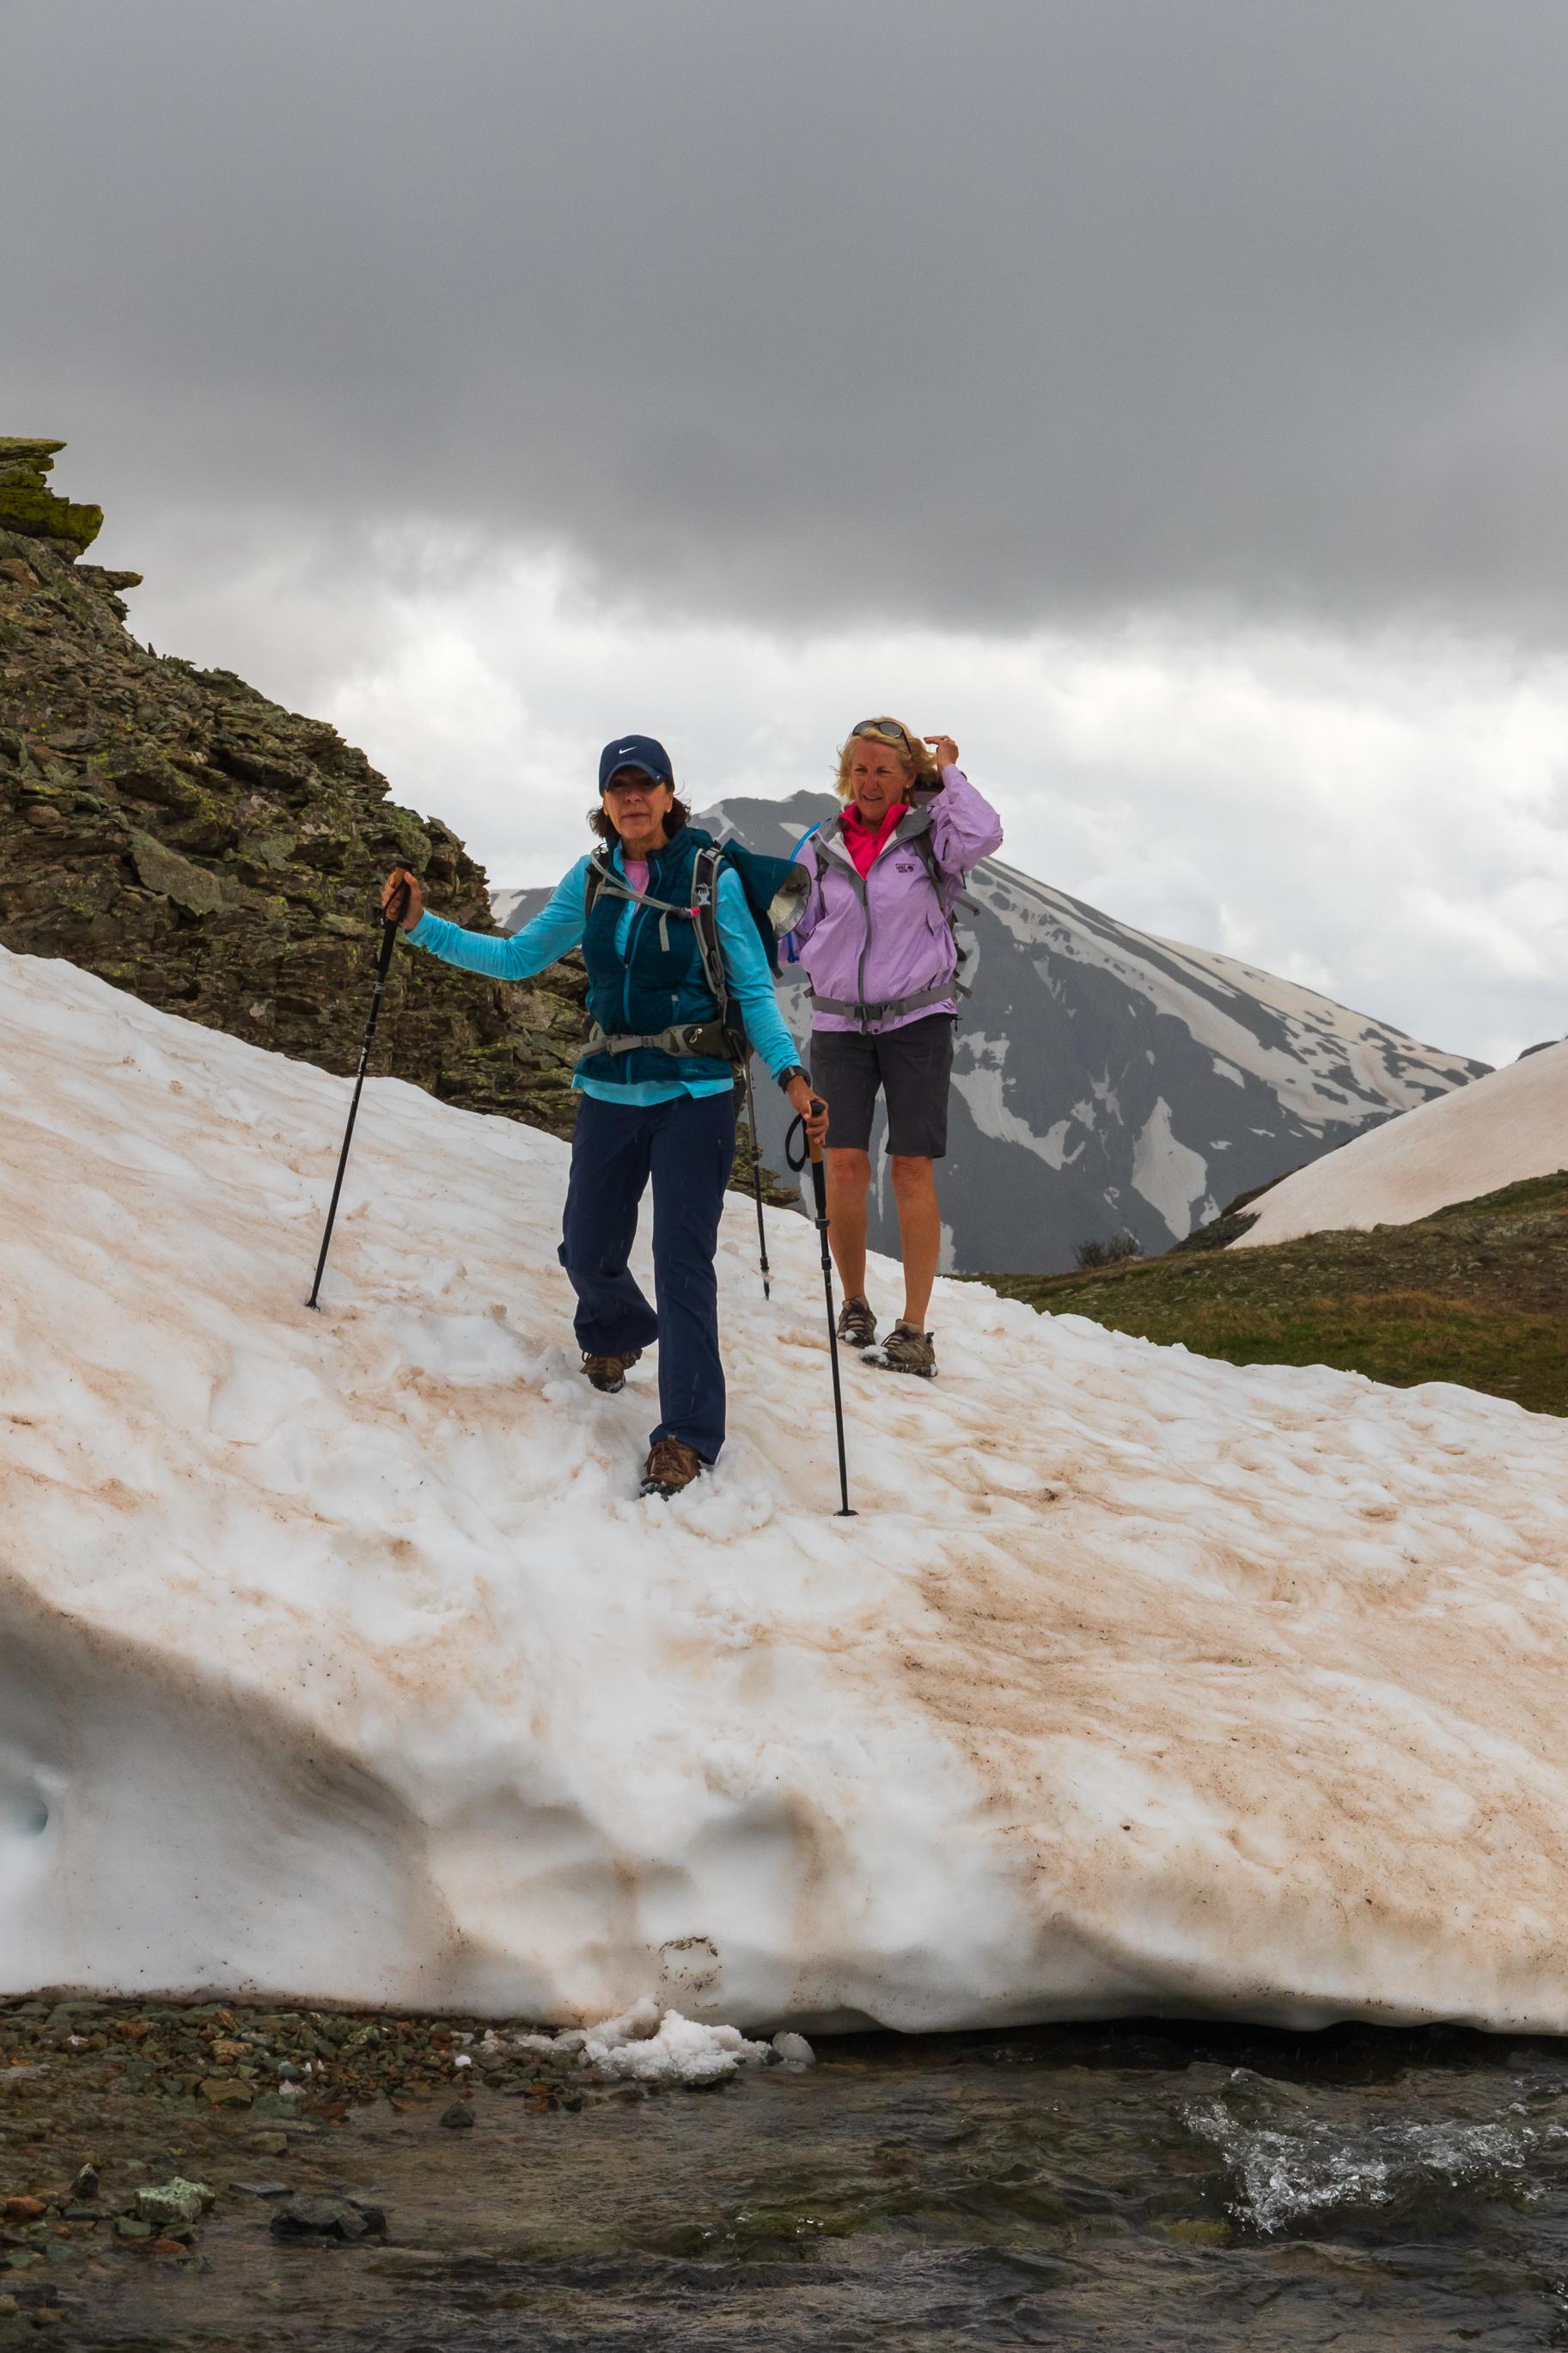 Angela & Mary crossing the snow